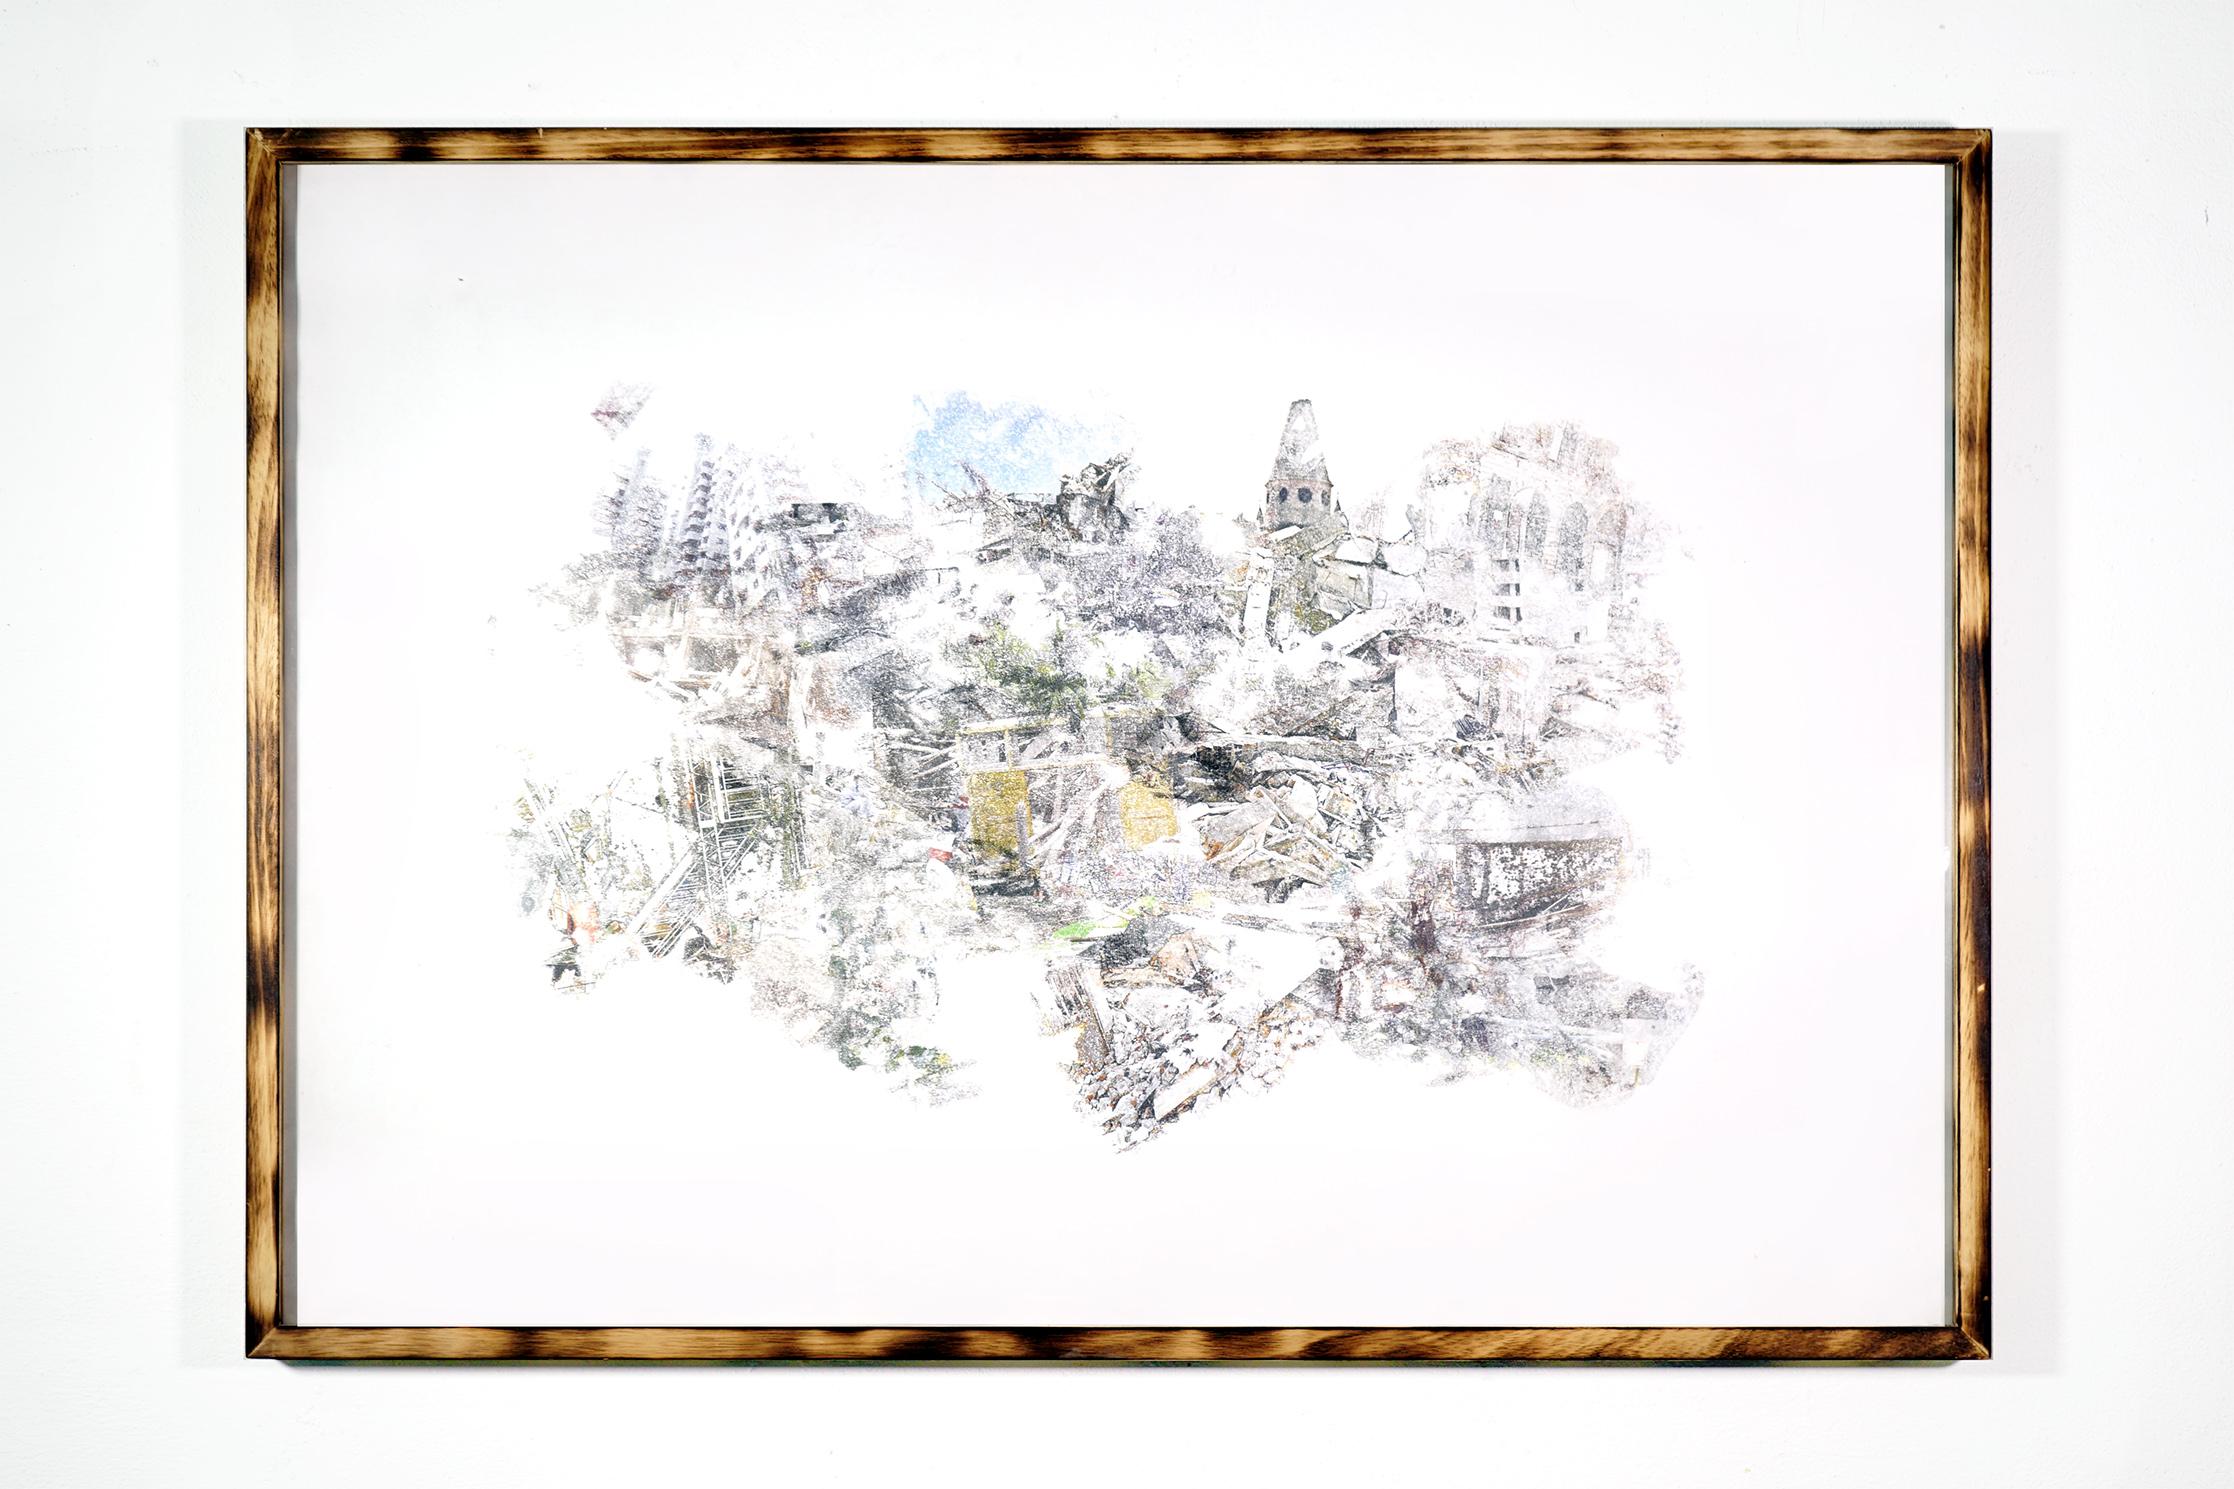 urban equalization #001 - 73x103cm with frame